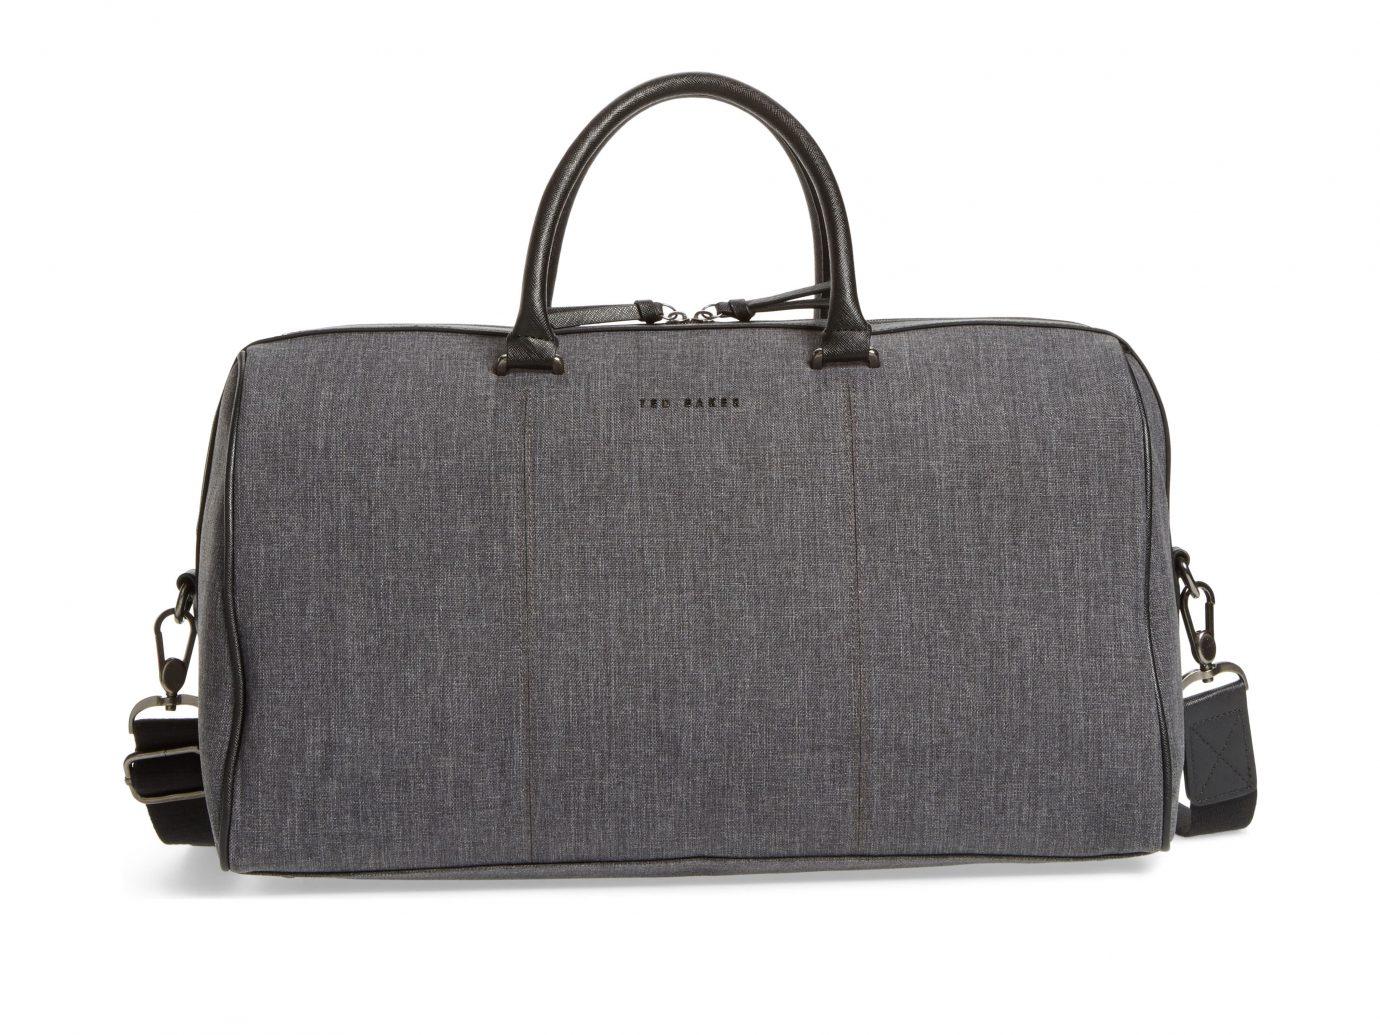 Ted Baker London Duffle Bag